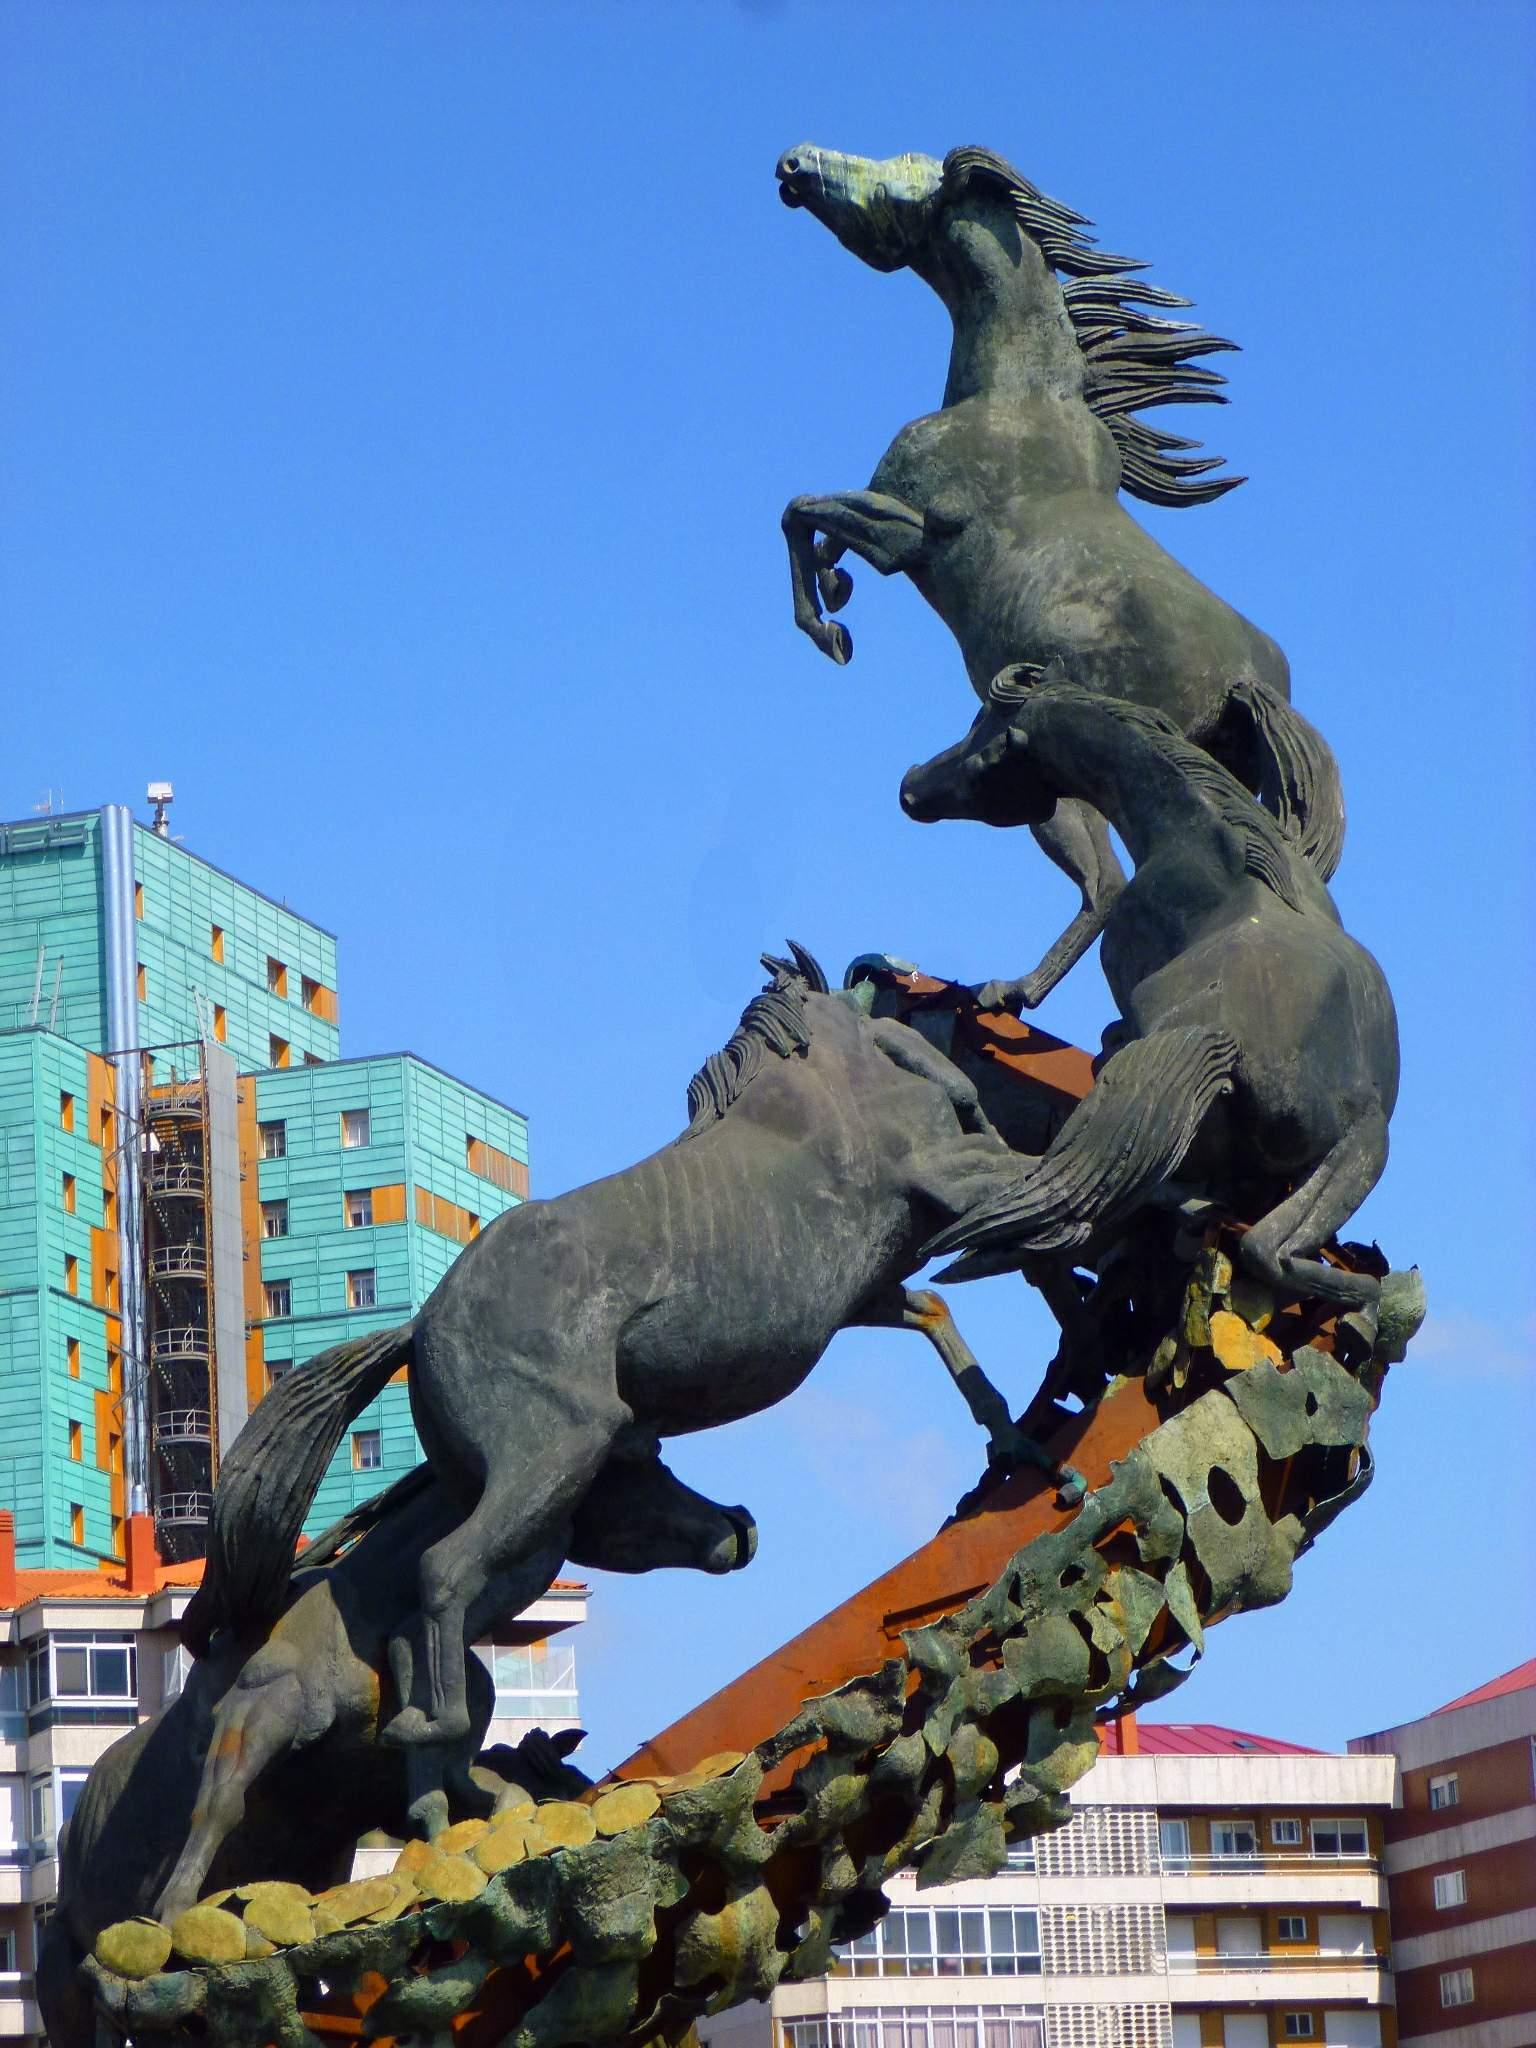 File:Vigo - Rotonda de la Plaza de España, Monumento a los Caballos 5.jpg